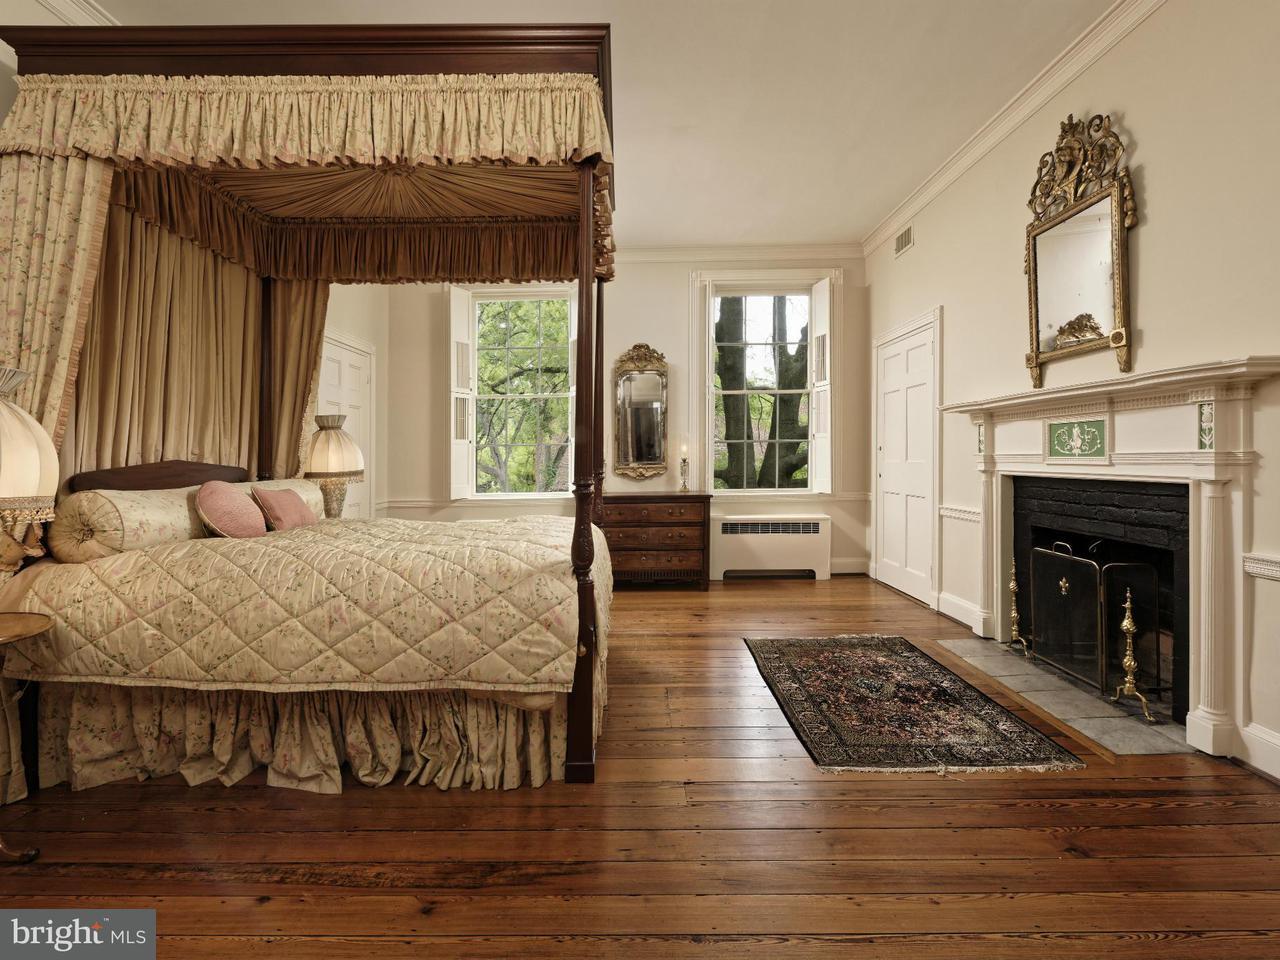 Additional photo for property listing at 301 SAINT ASAPH ST S 301 SAINT ASAPH ST S Alexandria, 버지니아 22314 미국